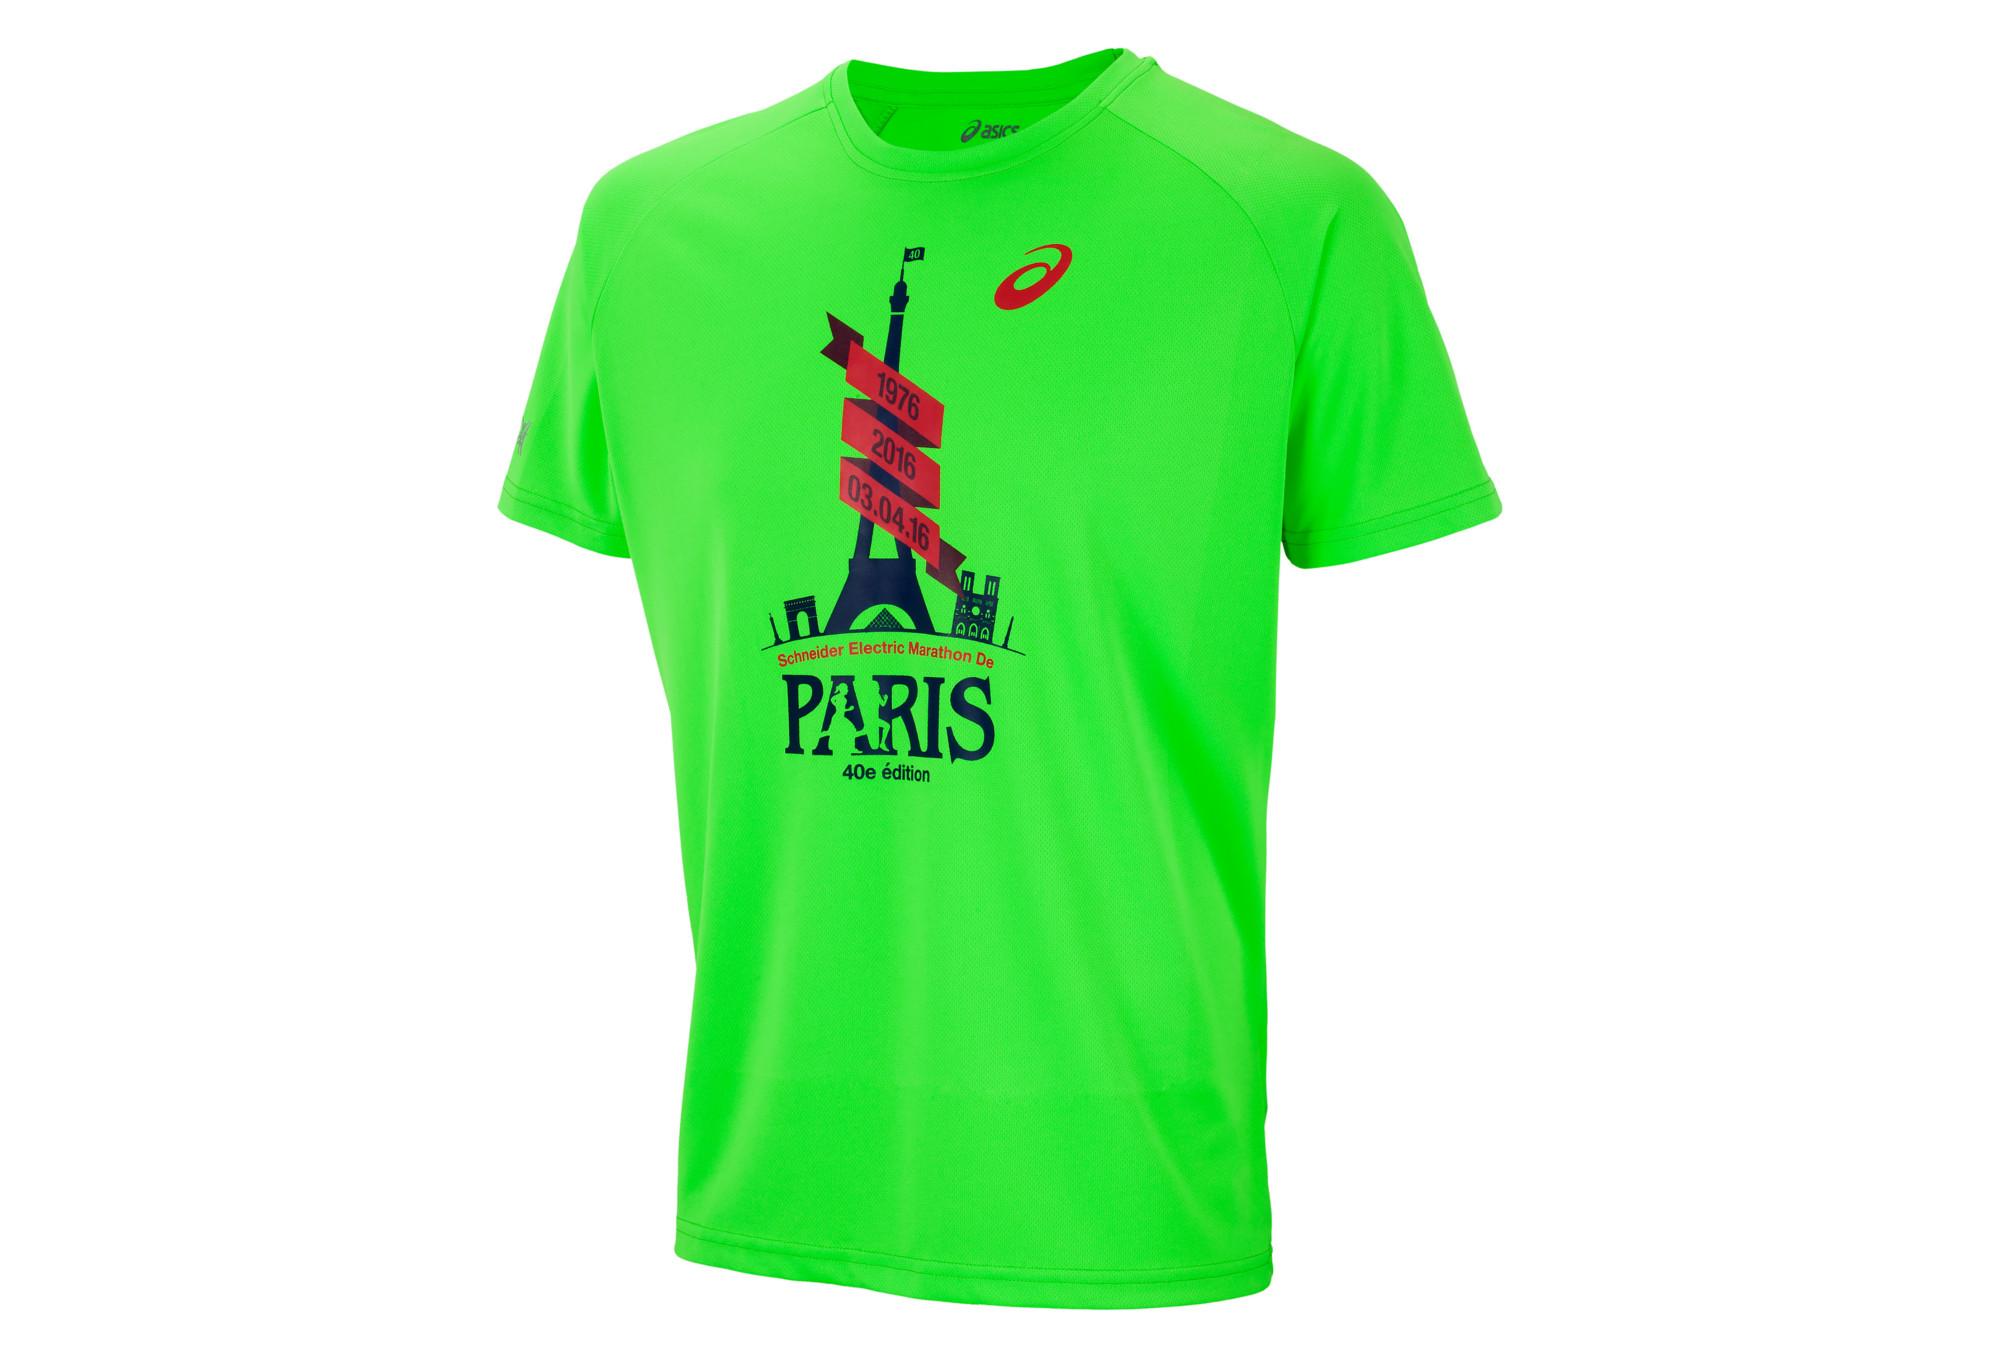 Asics t shirt printed schneider marathon de paris green for Marathon t shirt printing